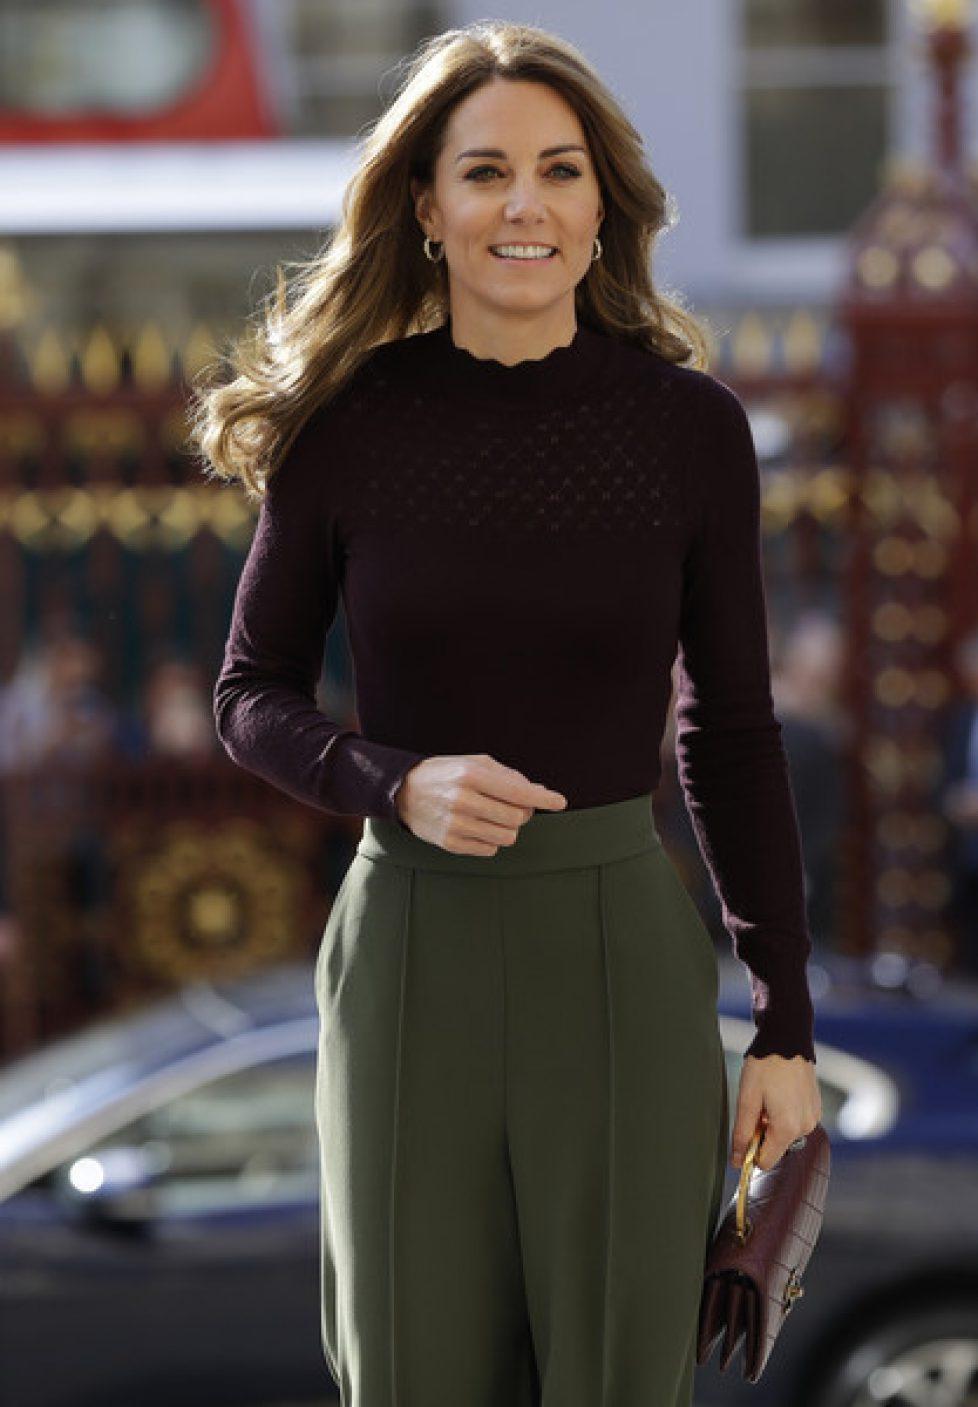 Duchess+Cambridge+Visits+Angela+Marmont+Centre+PkhlD0YfHNZl